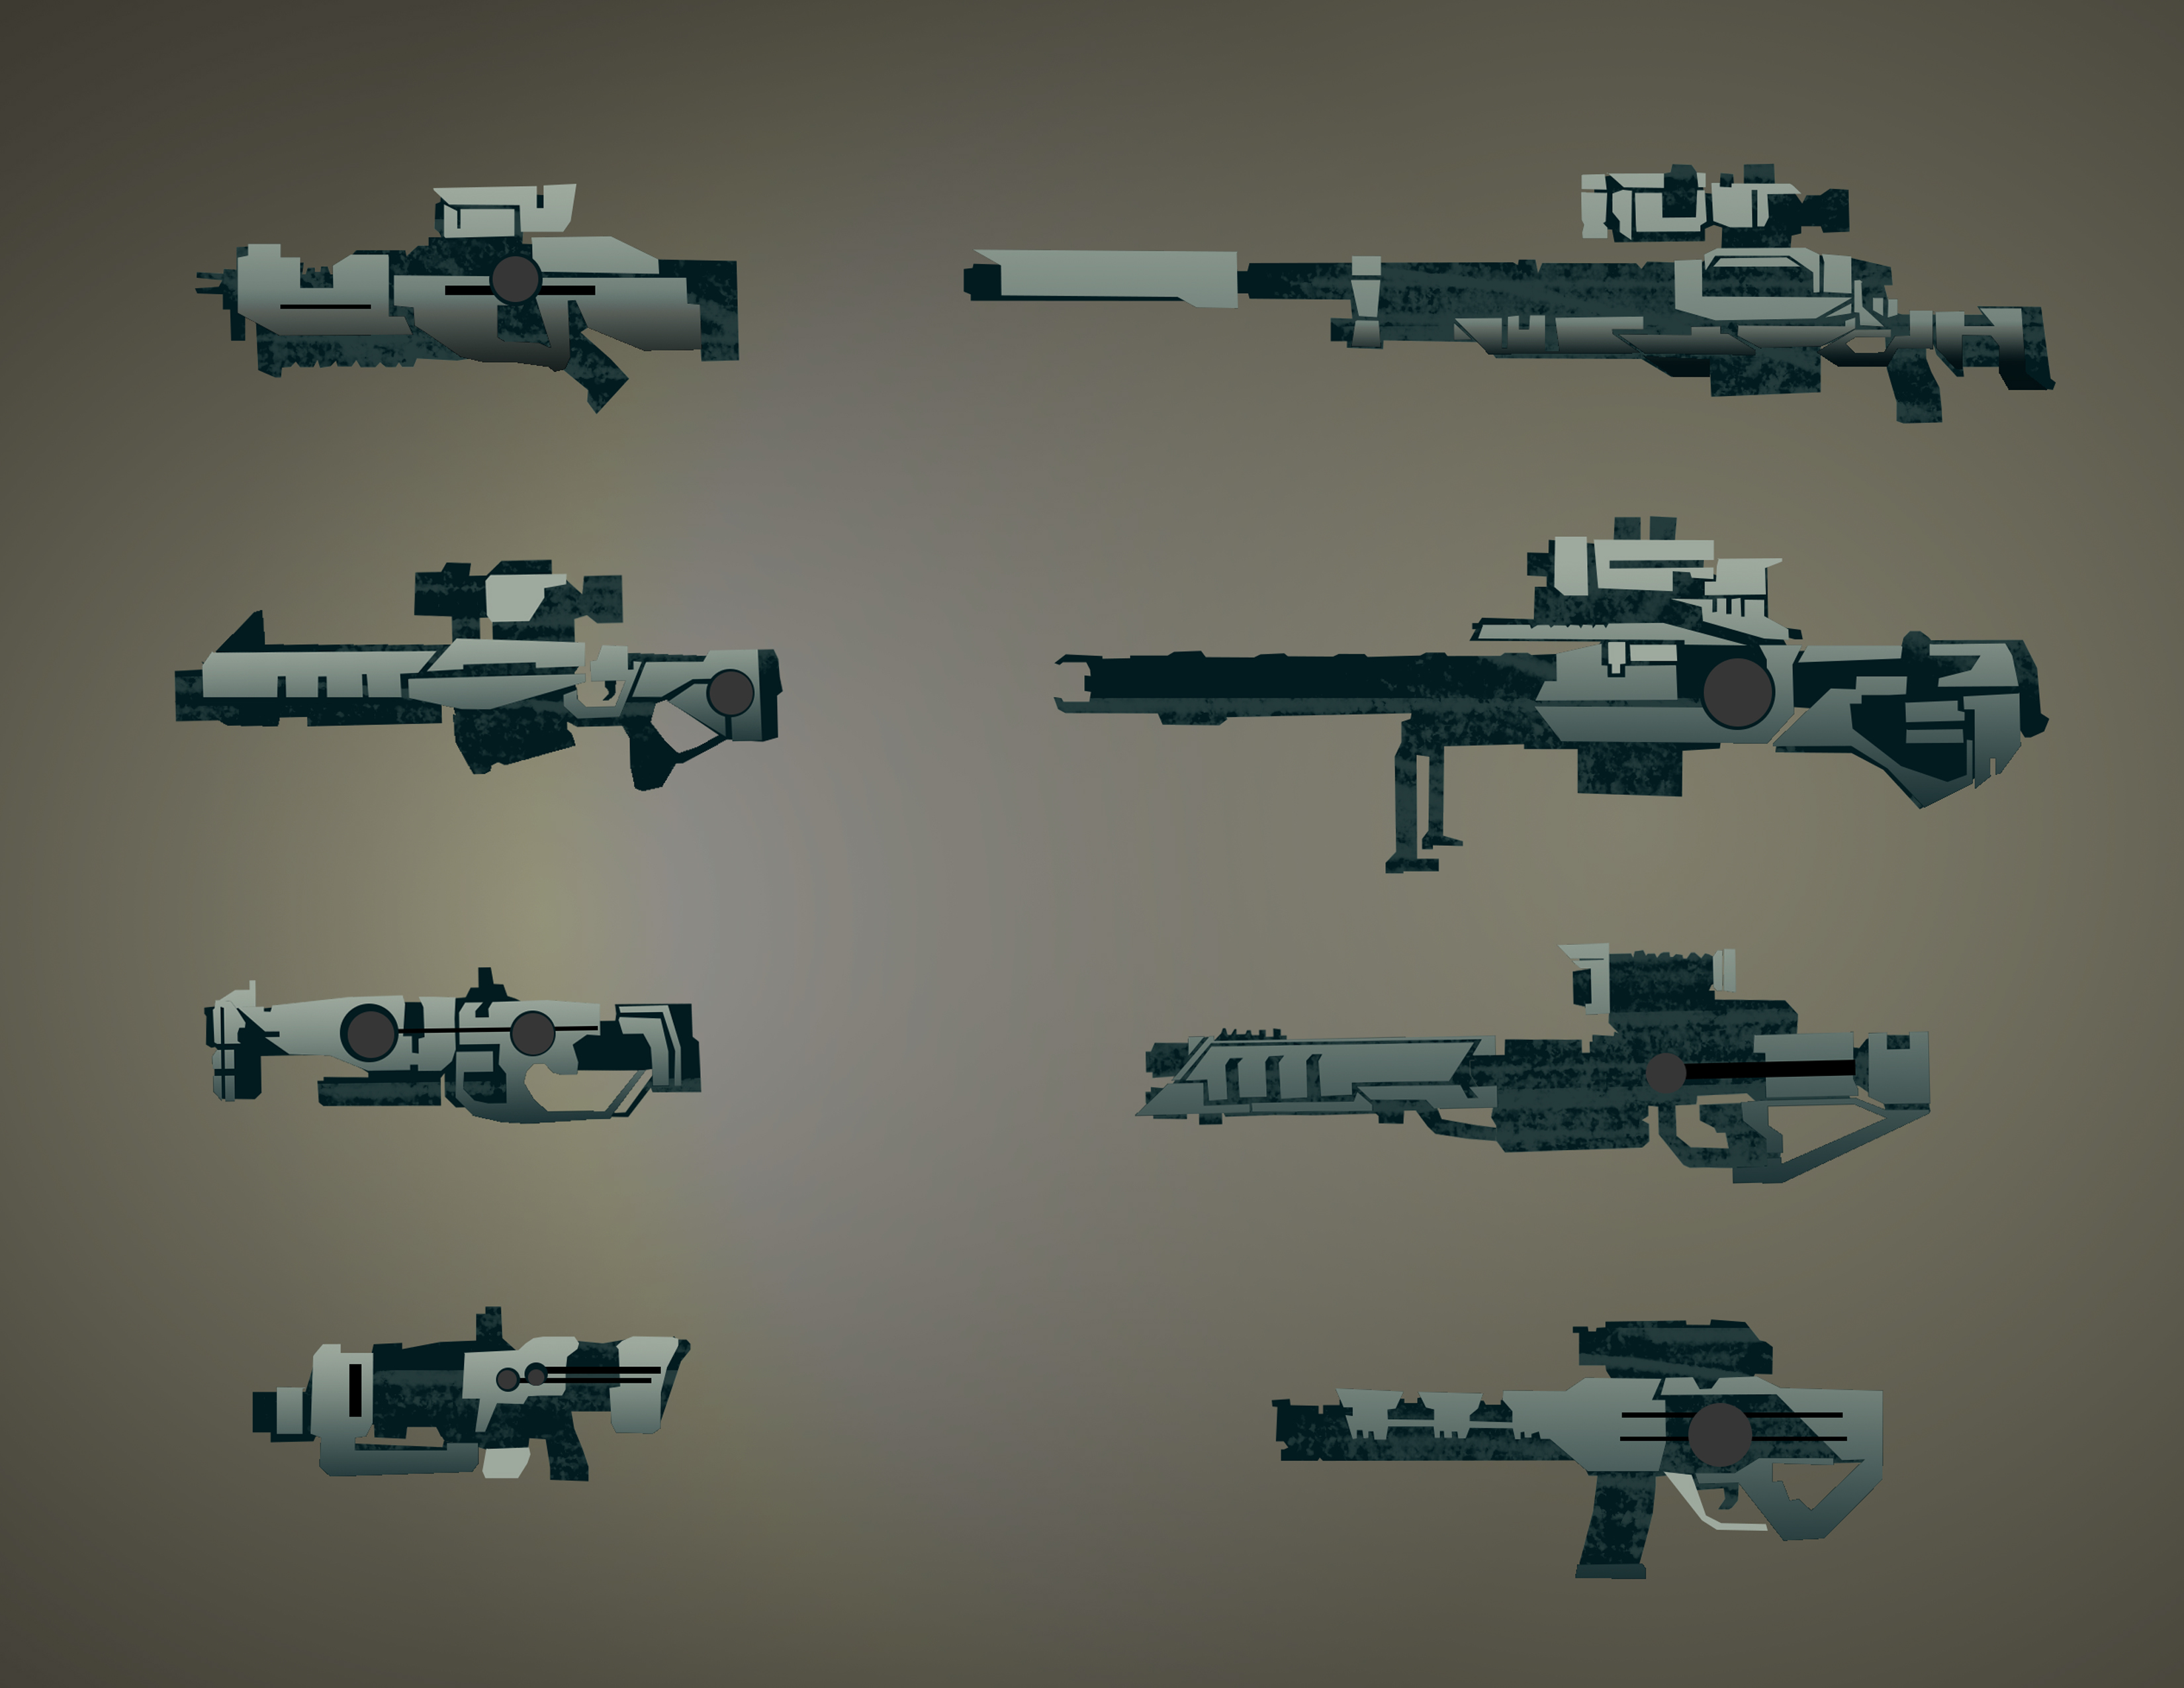 Gun_sill